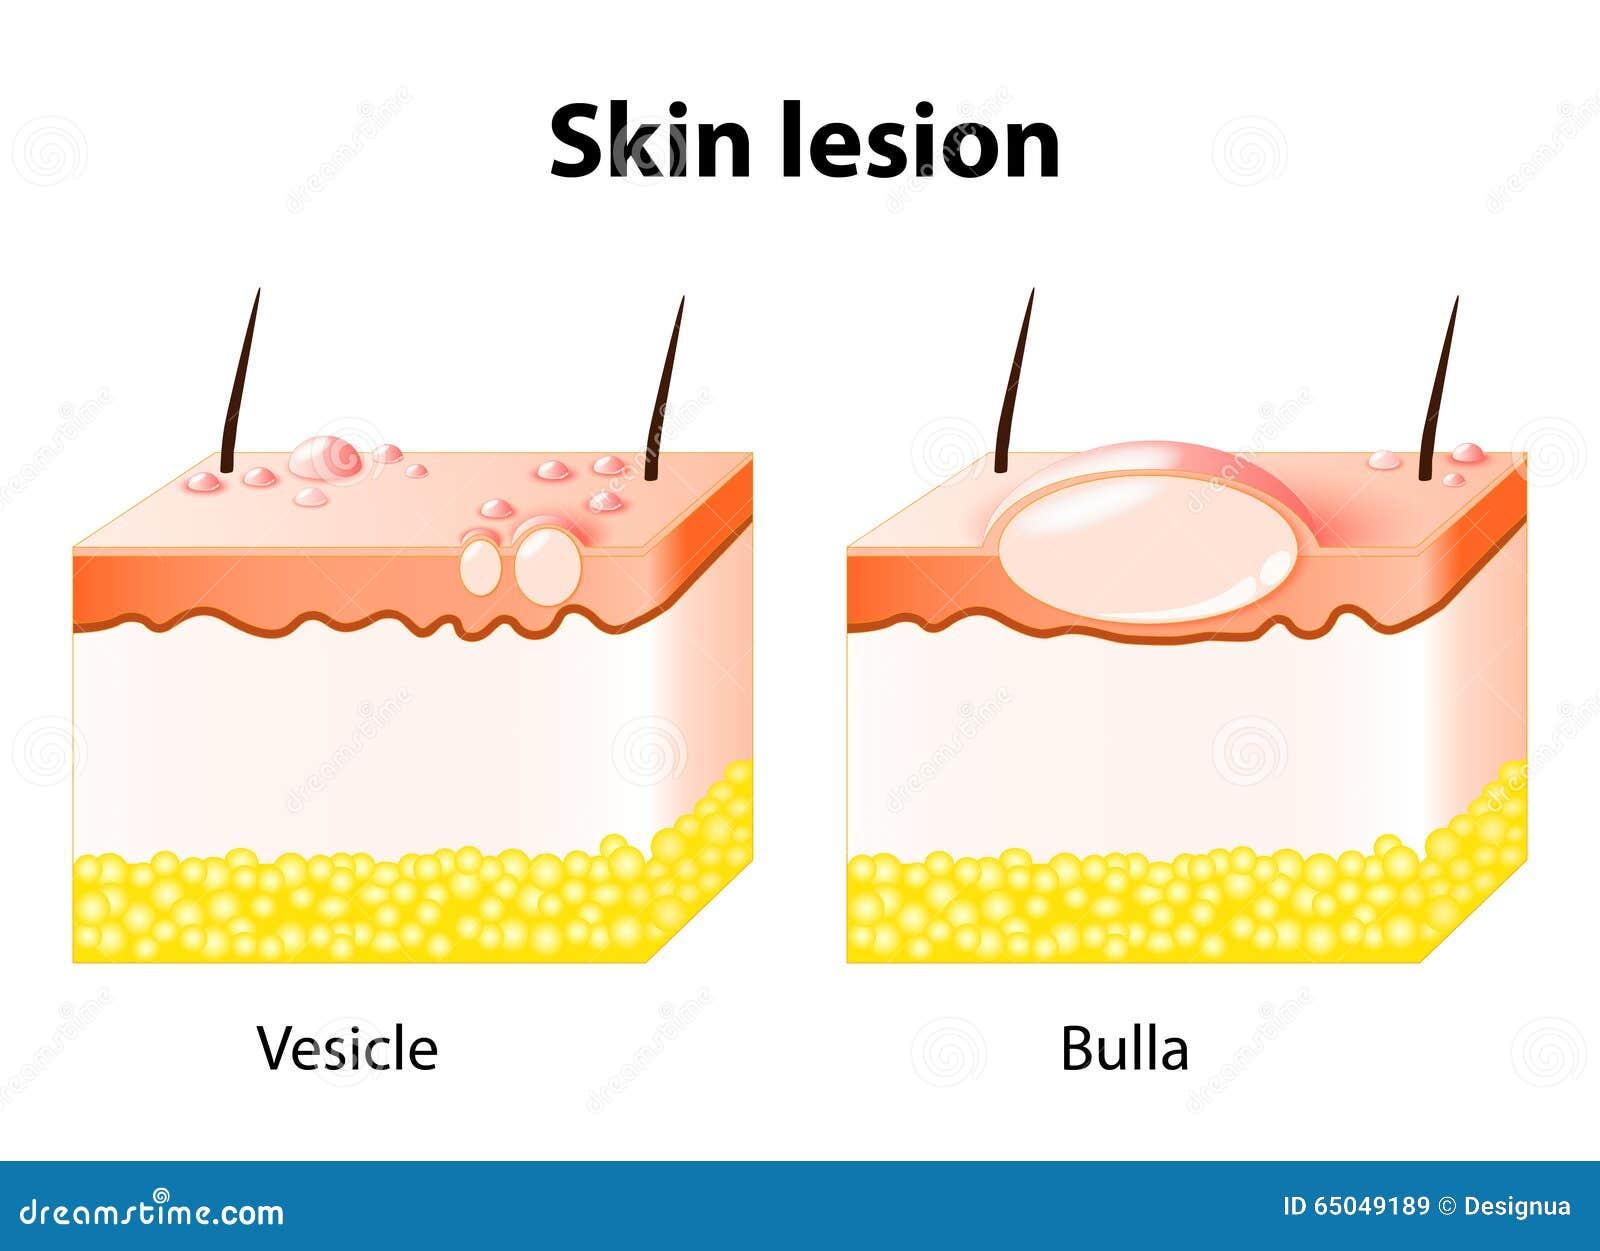 Vesicle And Bulla. Skin Lesion Stock Vector - Illustration ...